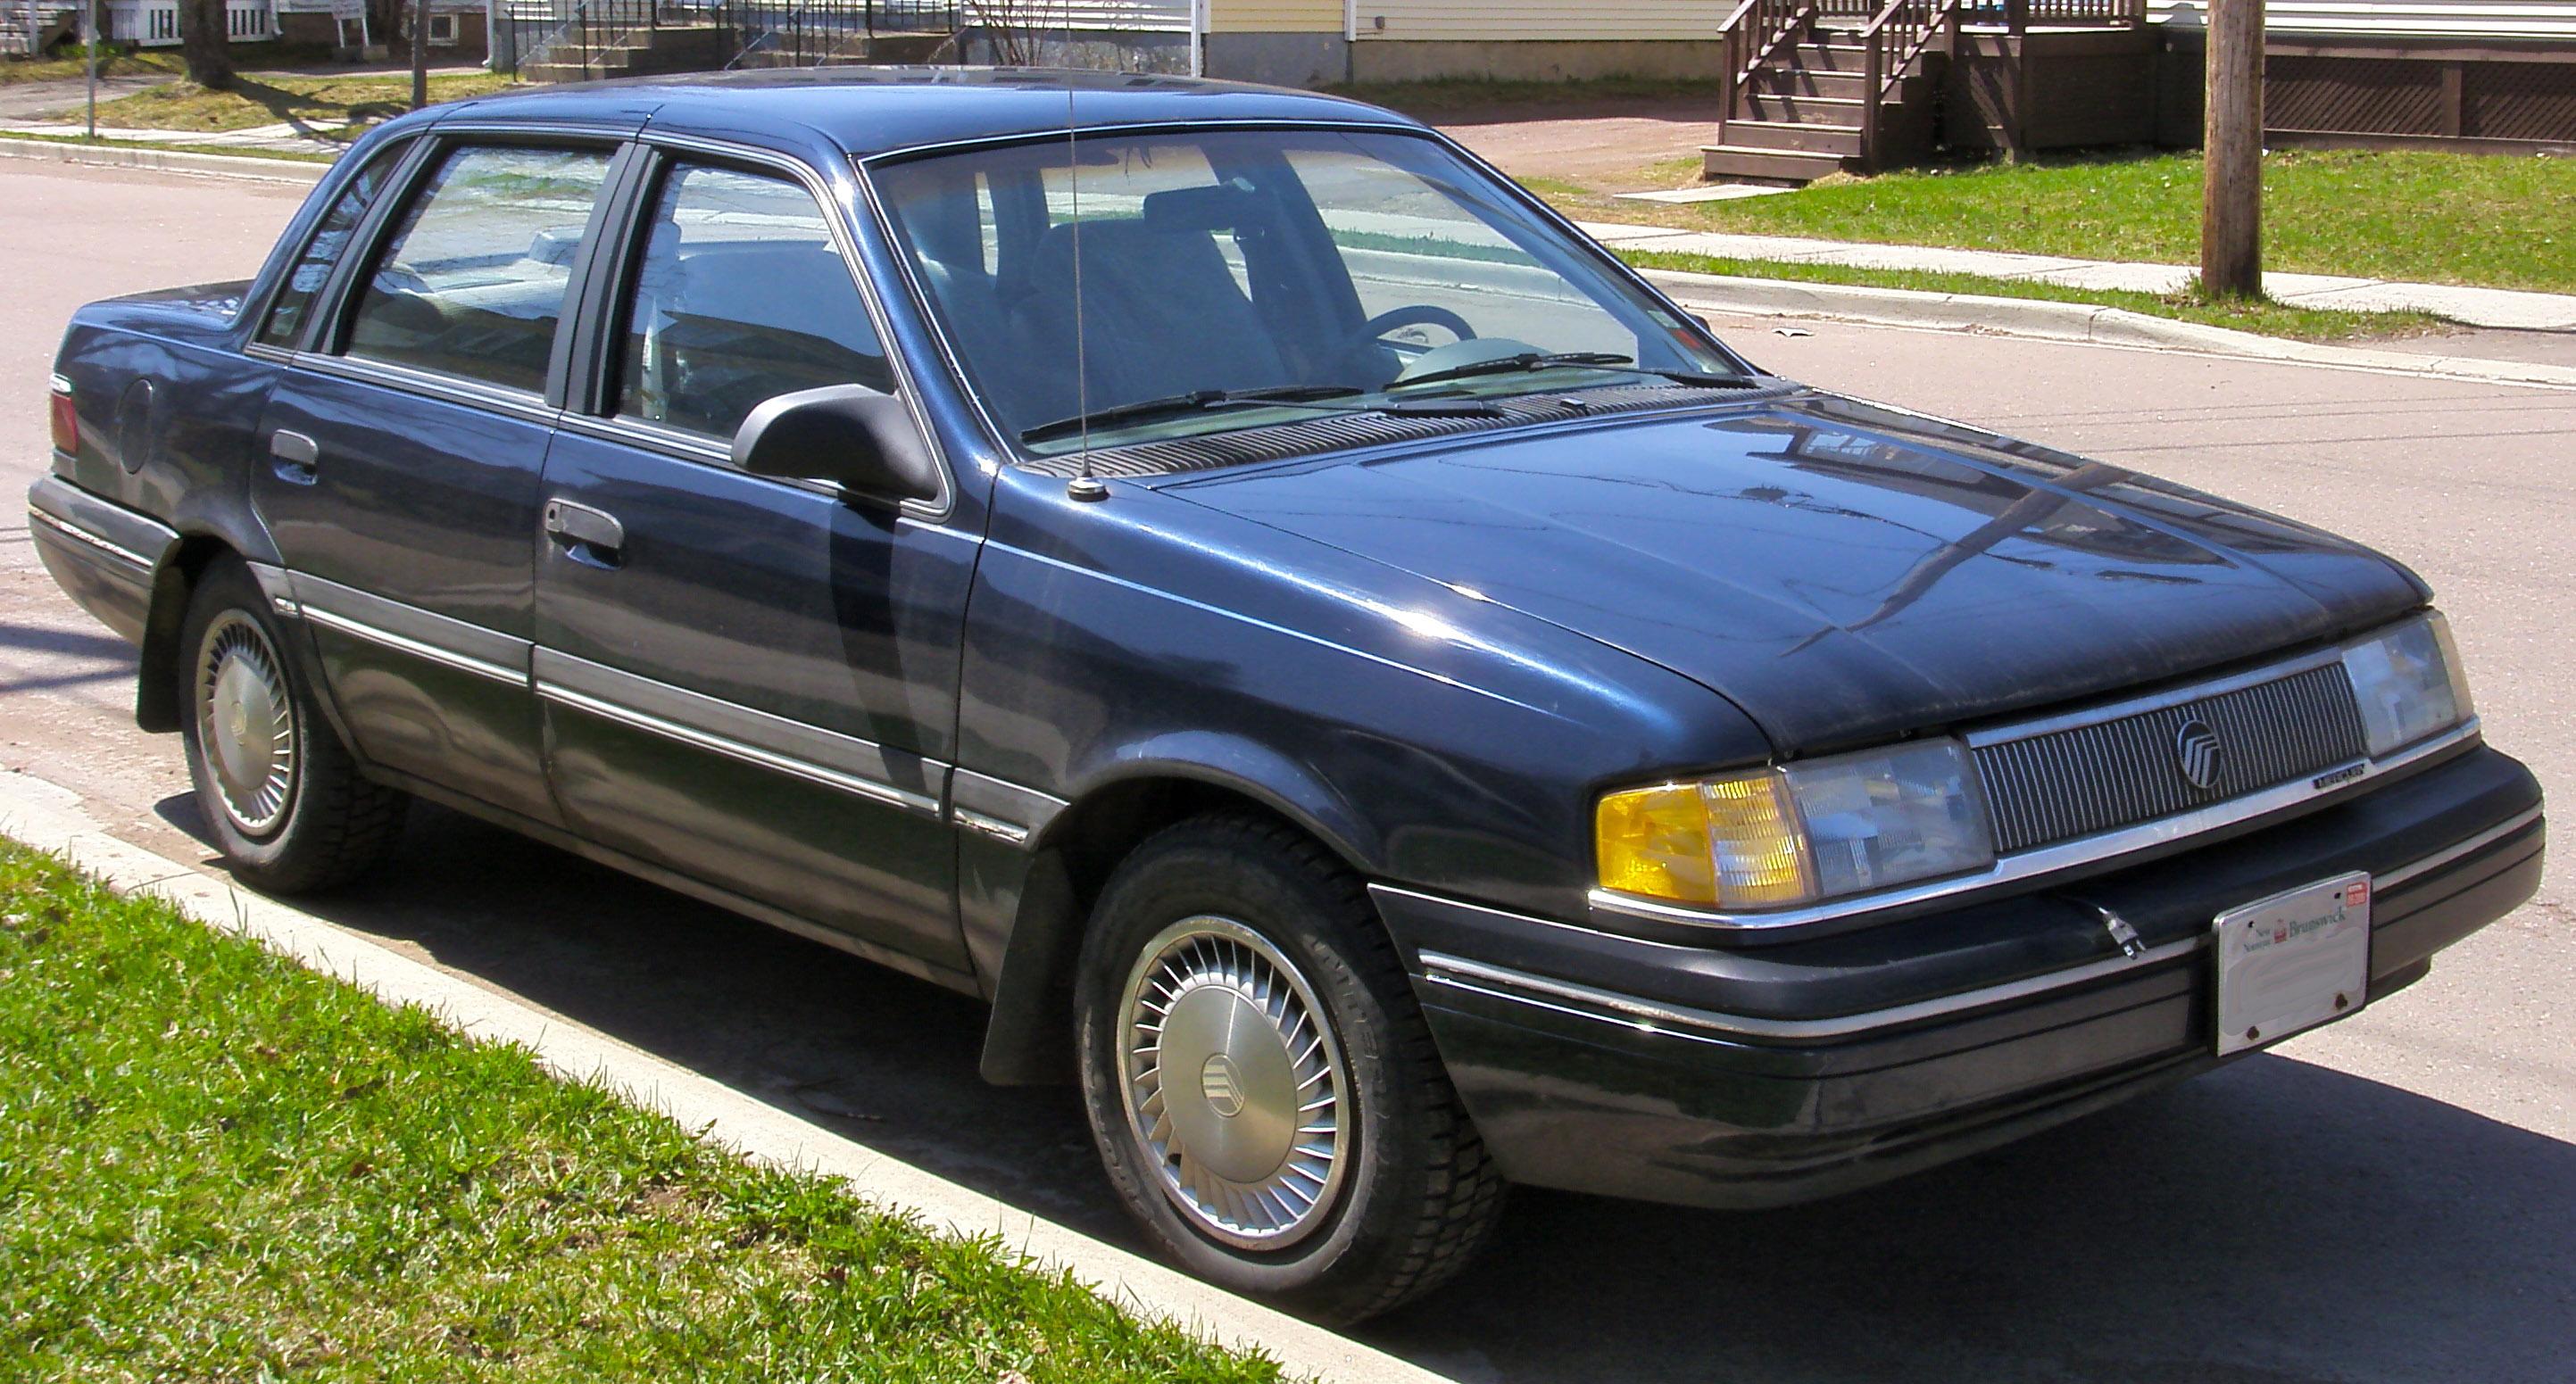 1993 buick lesabre fuse box te 6423  moreover 1993 buick lesabre on 1992 mercury topaz fuse  buick lesabre on 1992 mercury topaz